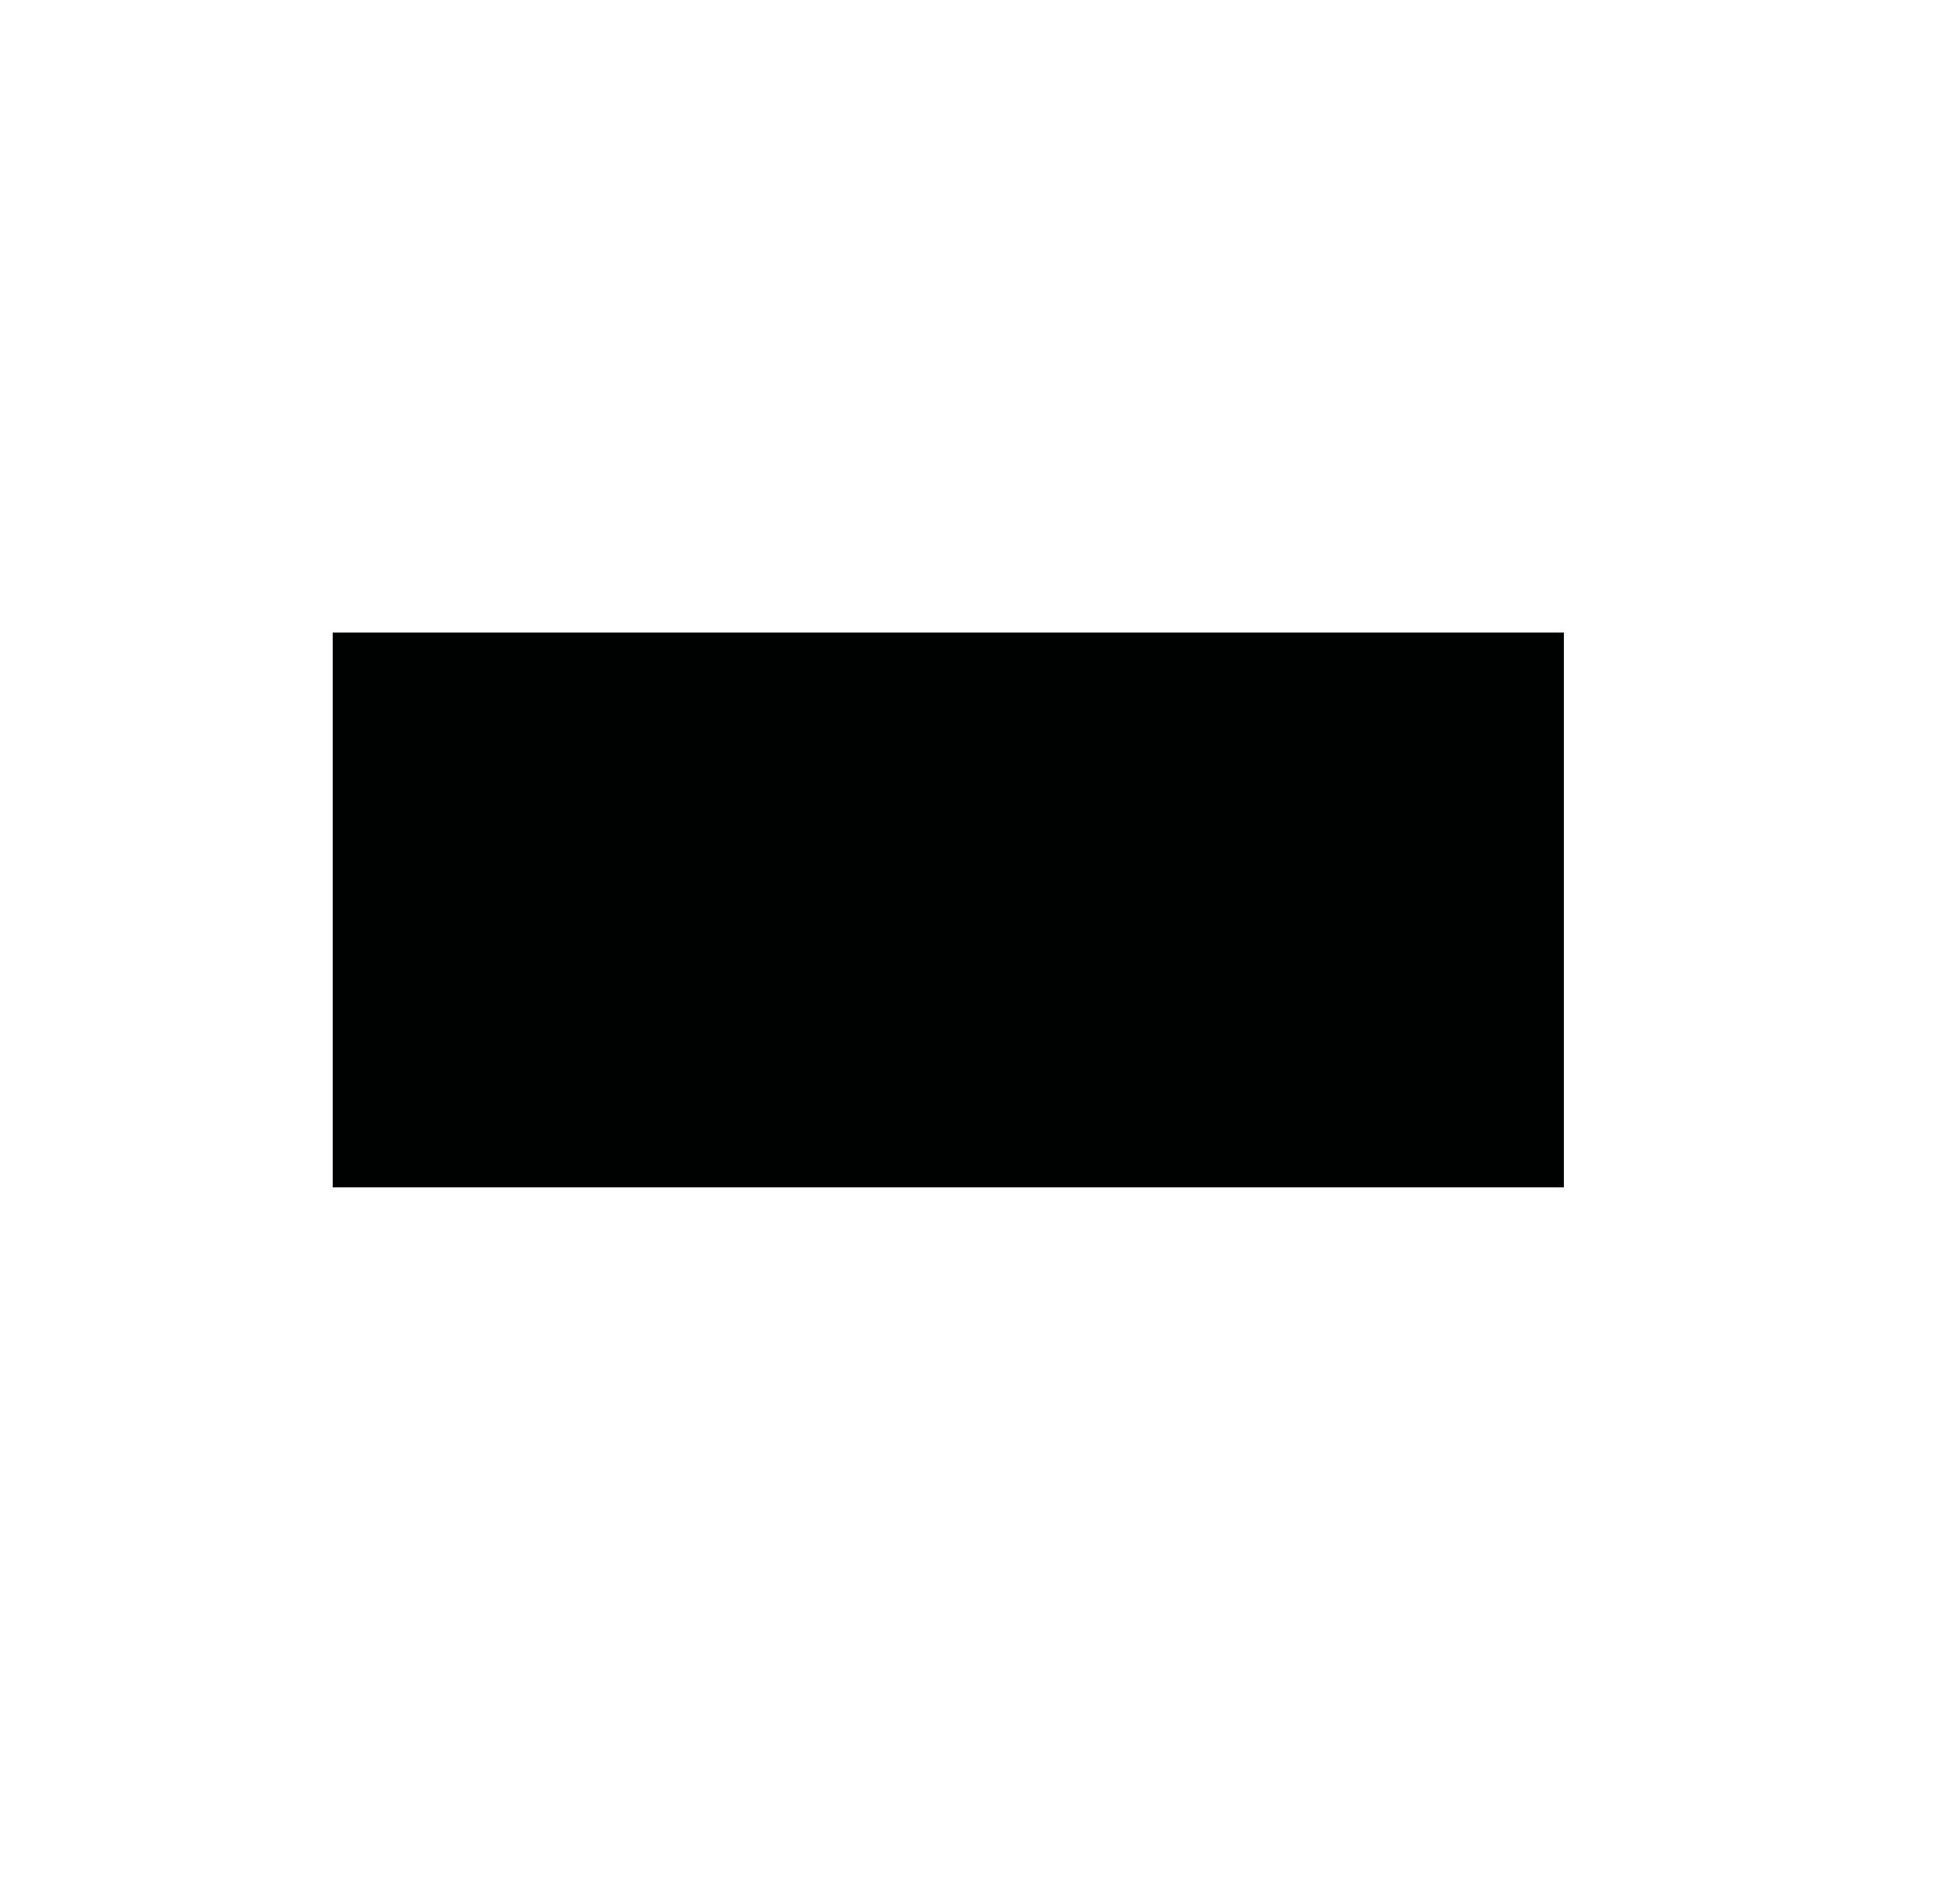 Rx4 Everlasting Health Logo